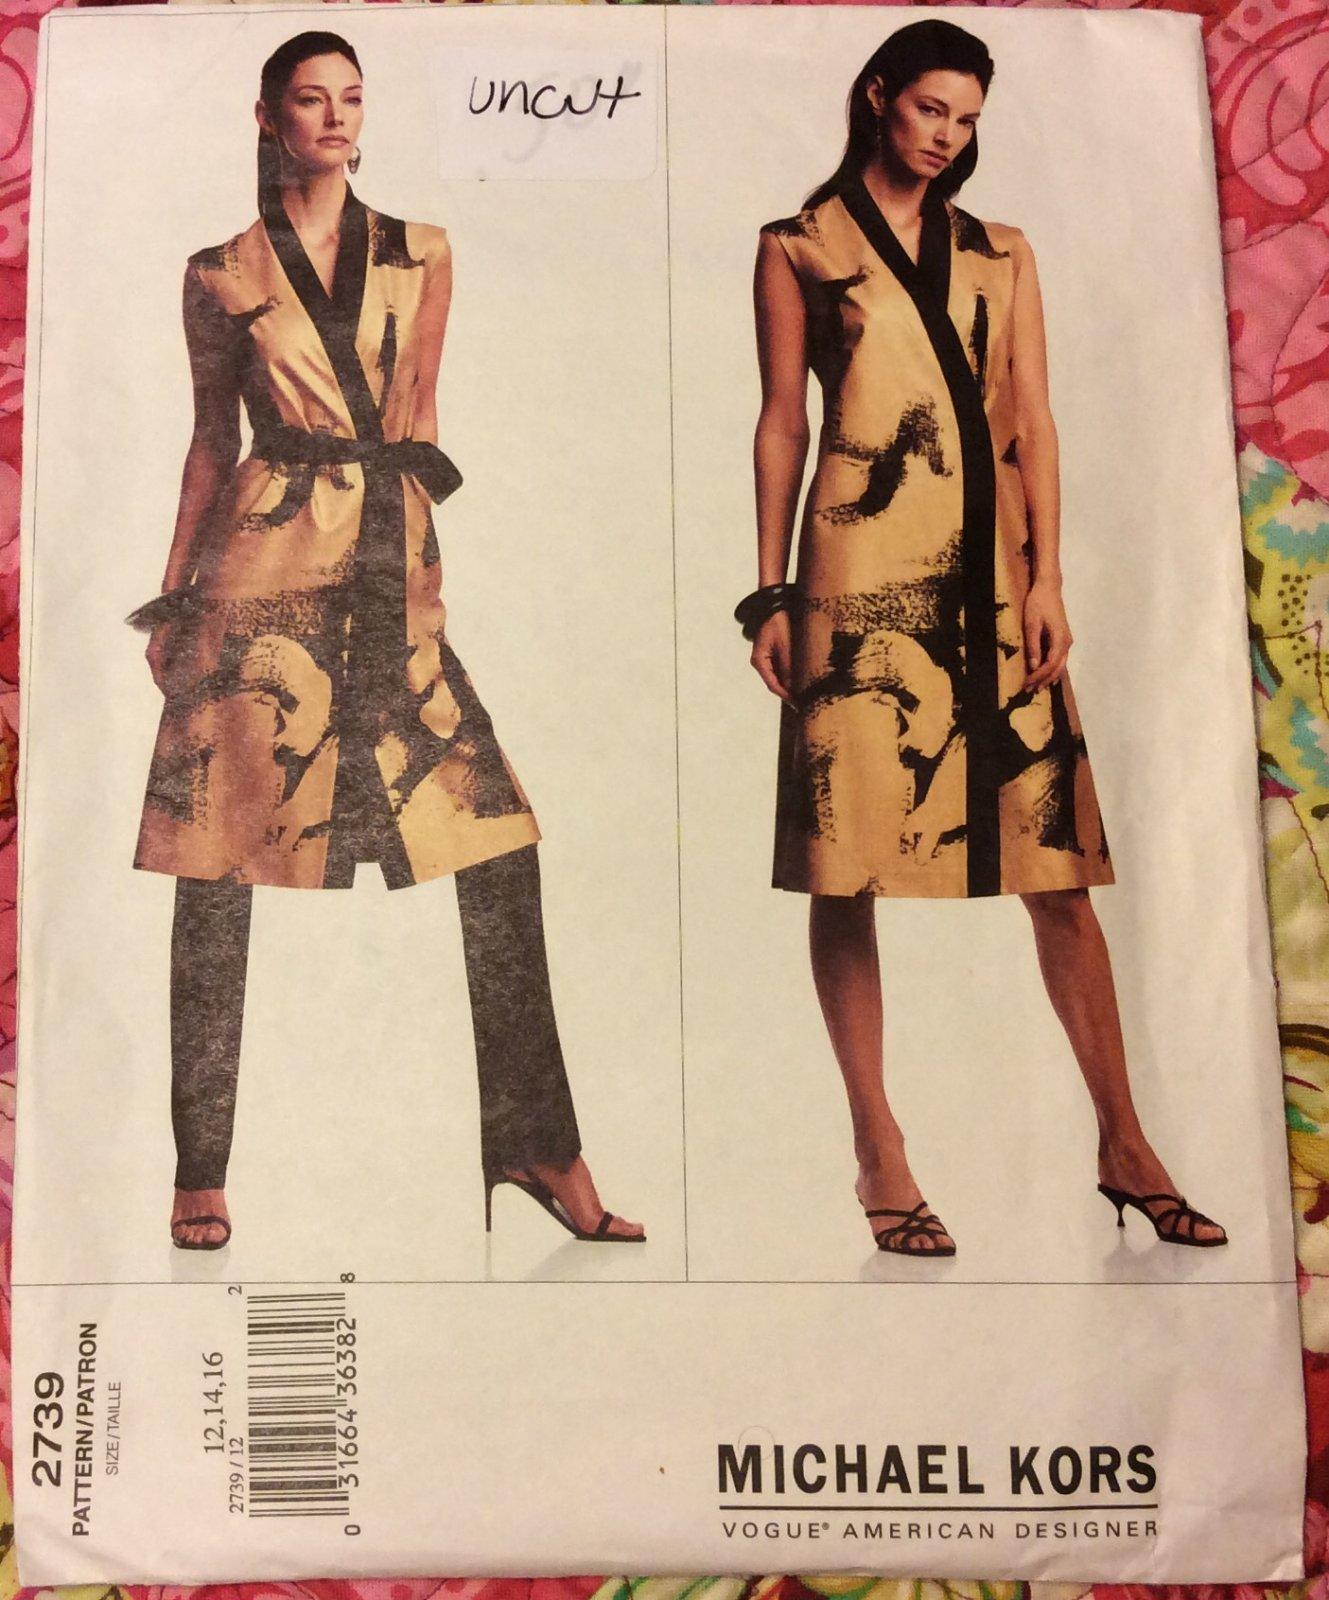 VINTAGE VOGUE American Designer MICHAEL KORS SEWING PATTERN 2739 Size 12 14 16 UNCUT VSB19